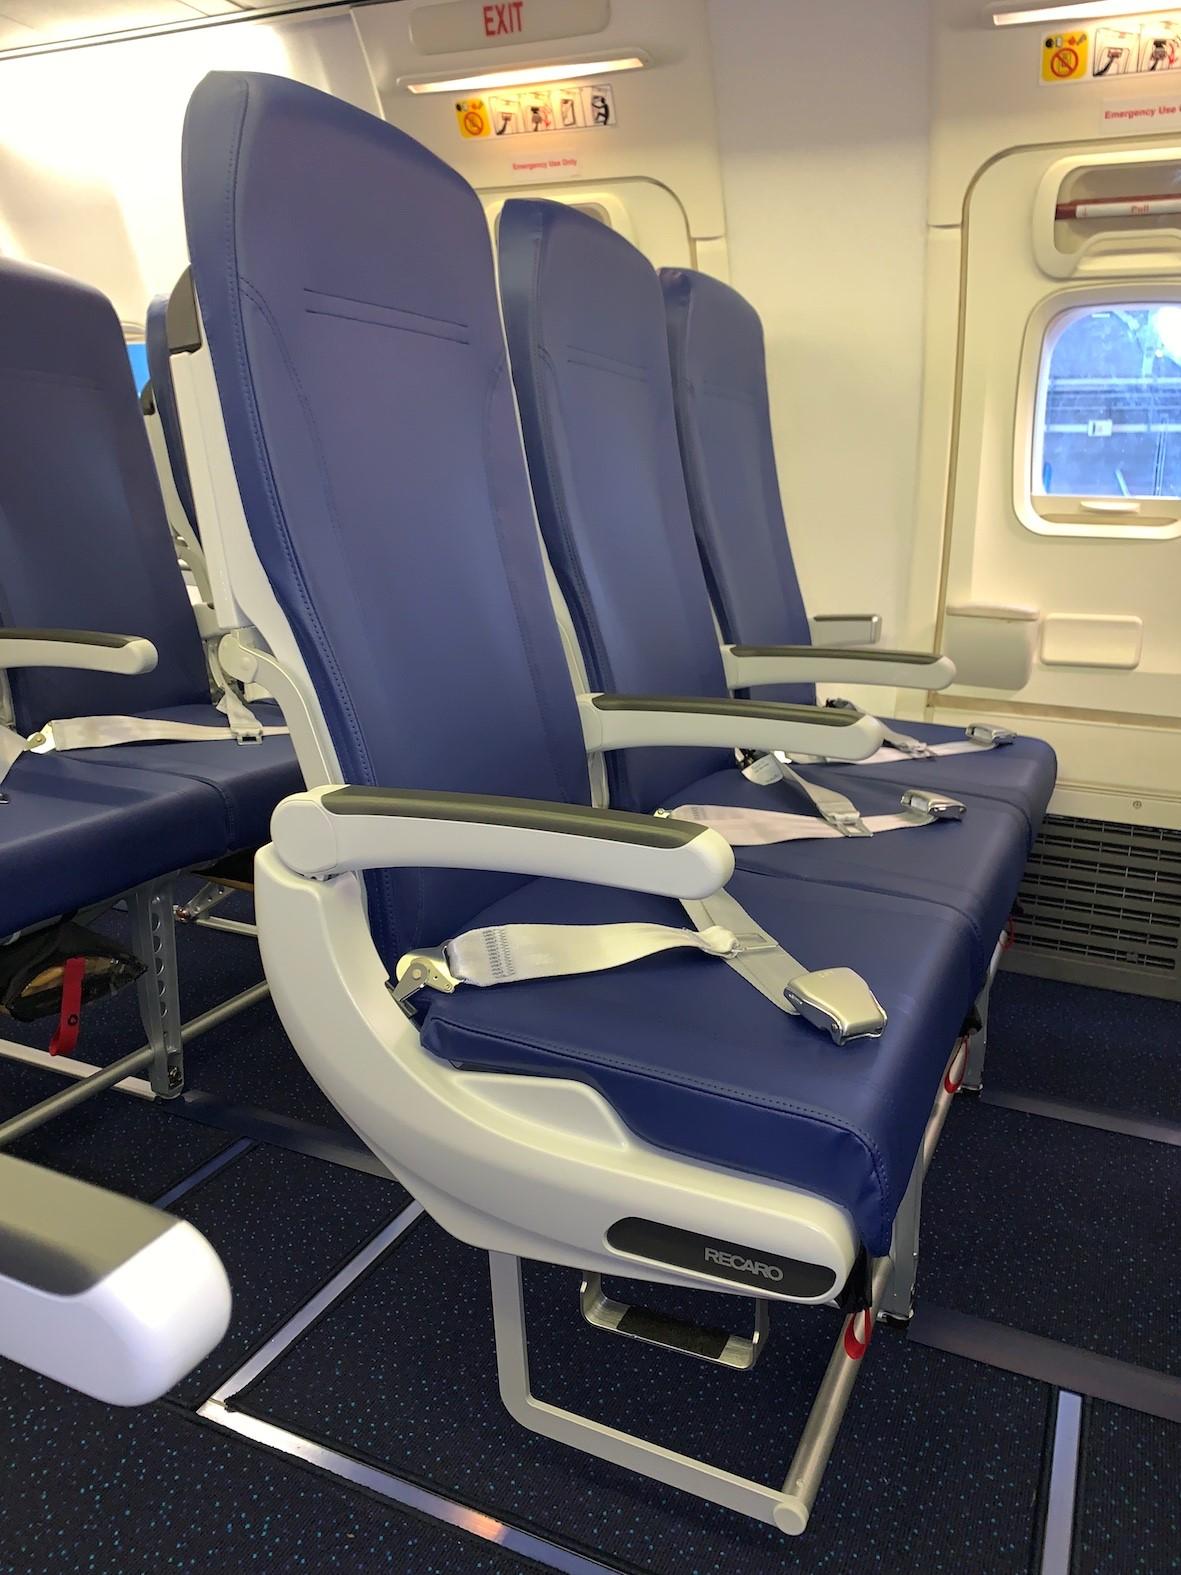 Aircraft Seats: Recaro Aircraft Seating Installs First Seats From SPRINT